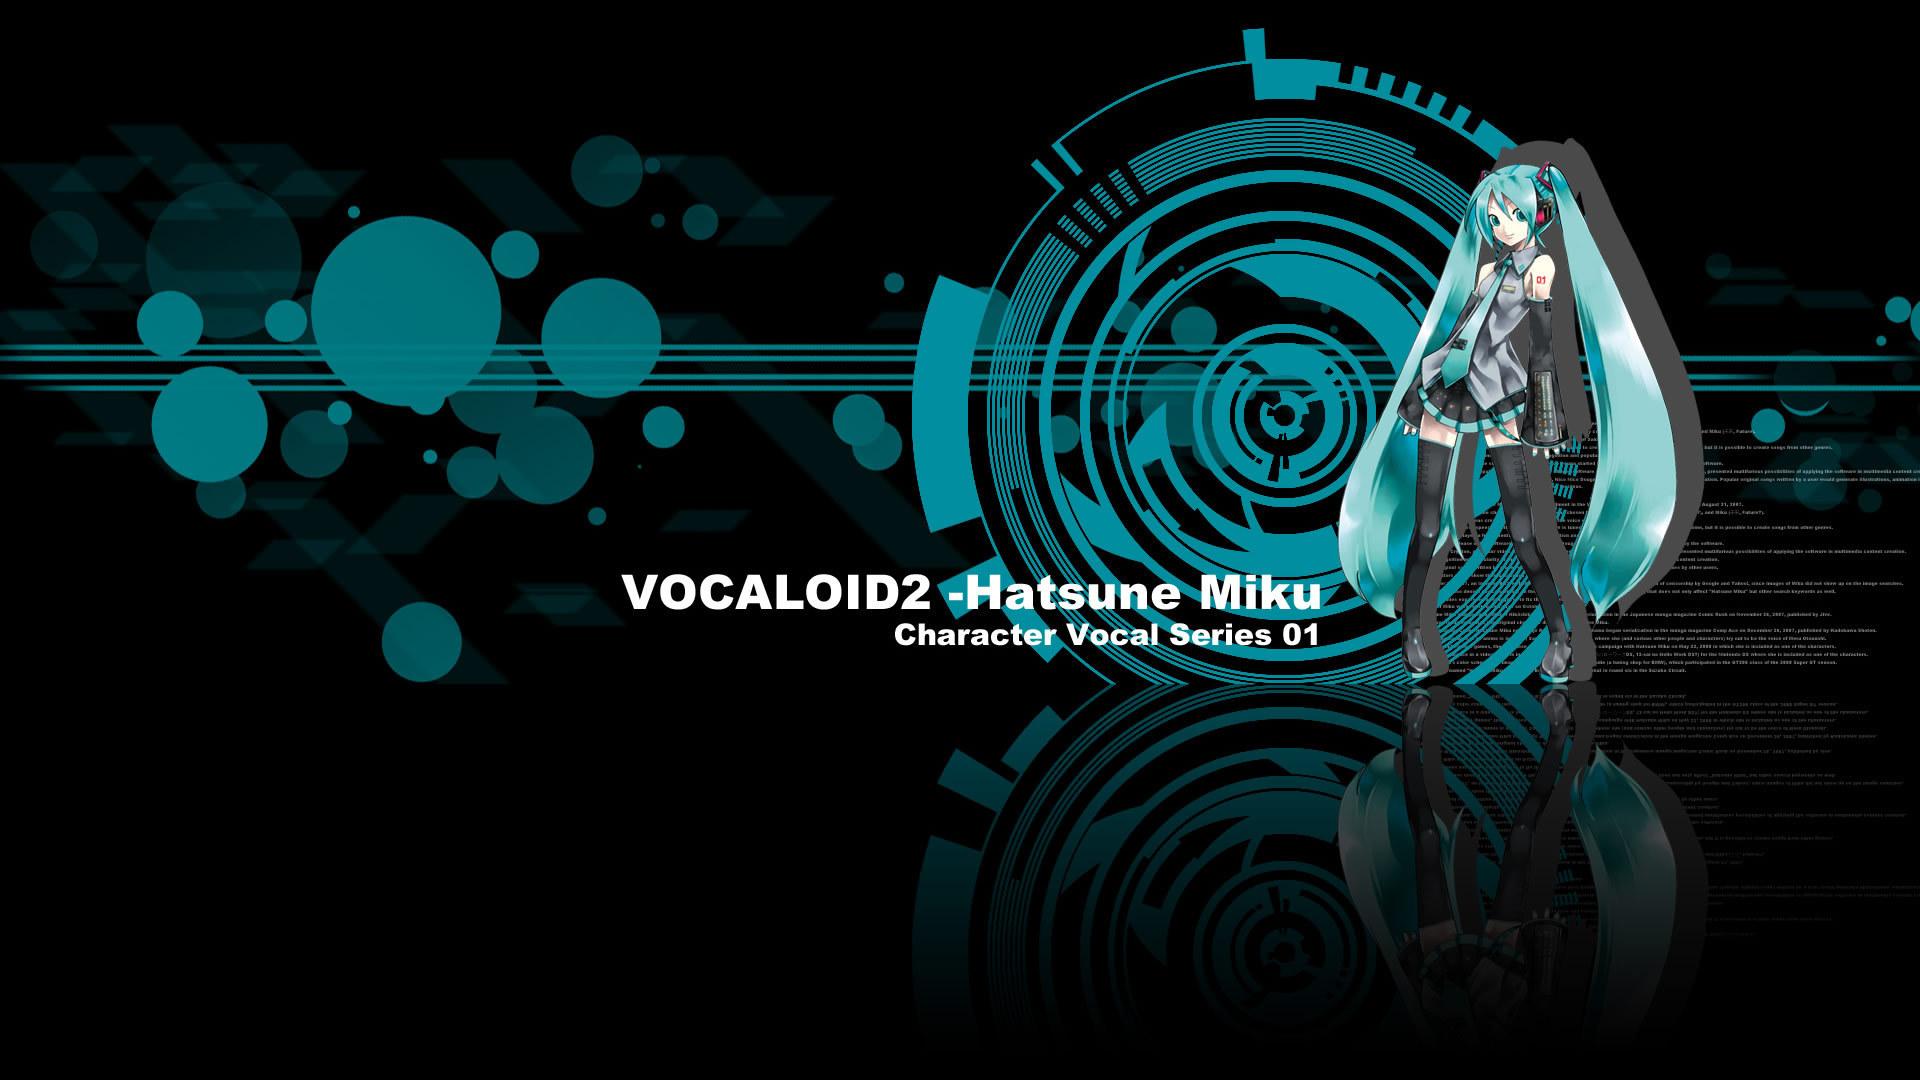 Miku Hatsune Vocaloid 壁紙 ボーカロイド 壁紙 13555606 ファン